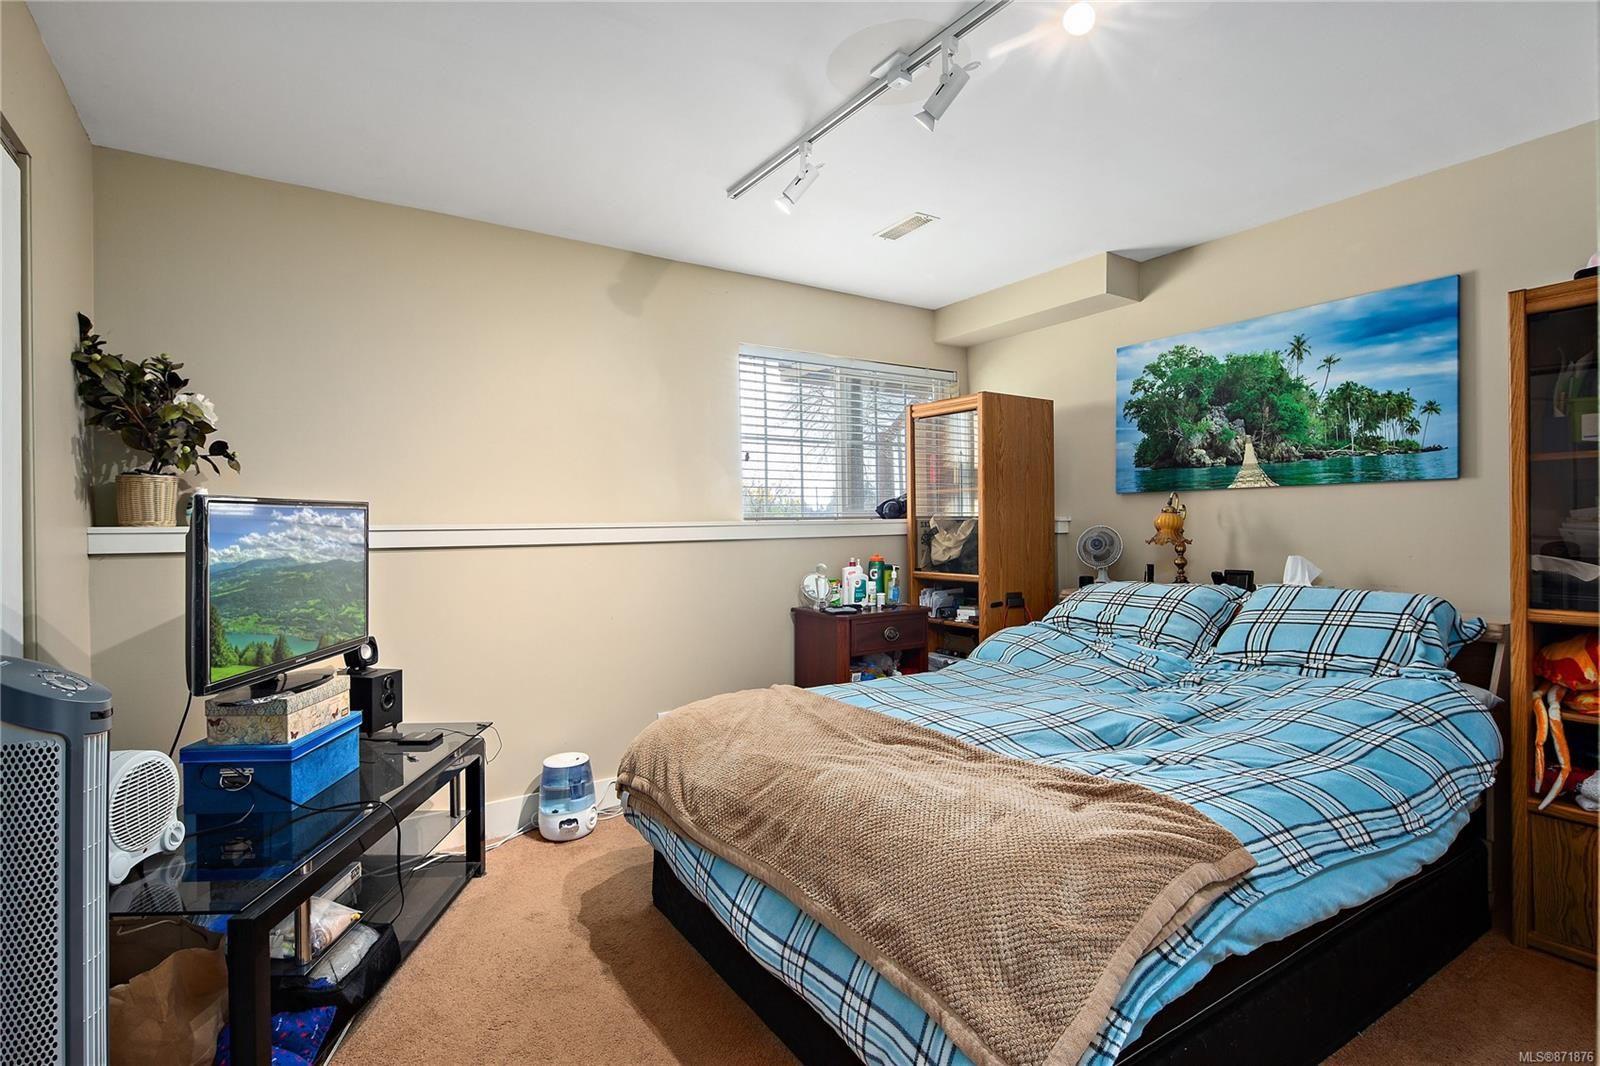 Photo 39: Photos: 4420 Wilkinson Rd in : SW Royal Oak House for sale (Saanich West)  : MLS®# 871876